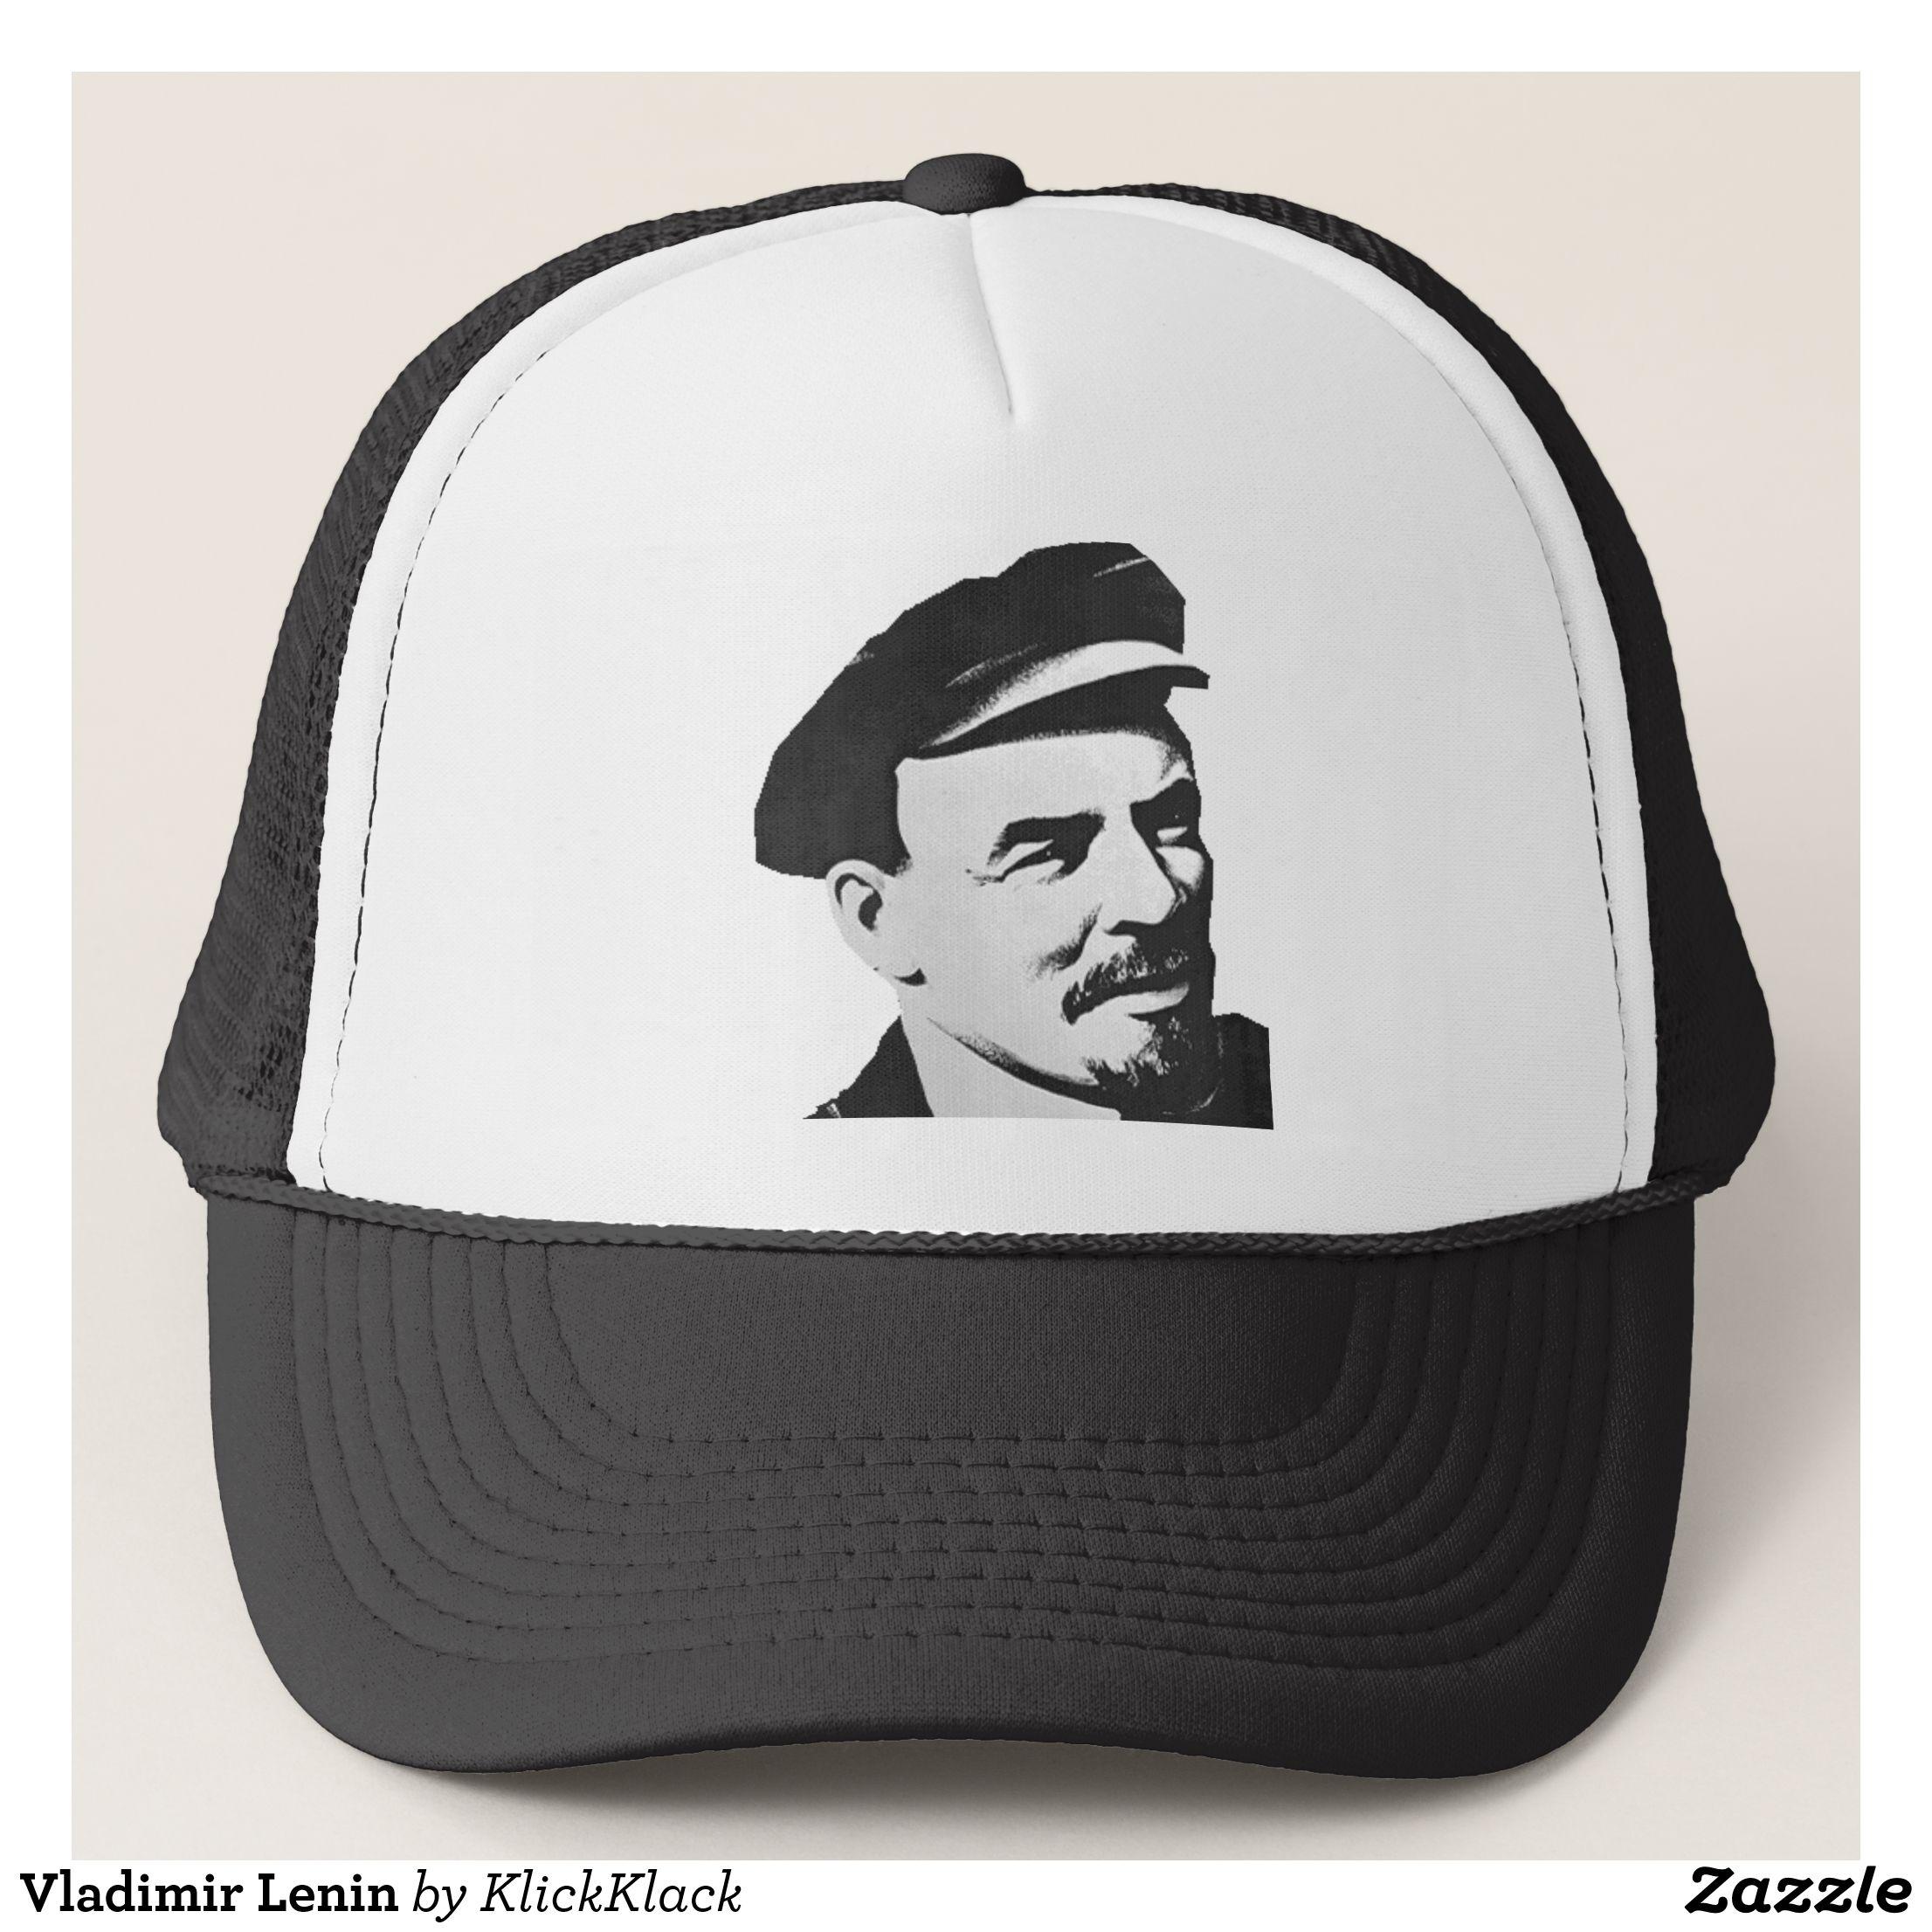 Vladimir Lenin Trucker Hat - Urban Hunter Fisher Farmer Redneck Hats By  Talented Fashion And Graphic Designers -  hats  truckerhat  mensfashion   apparel ... bd2bd7328eb